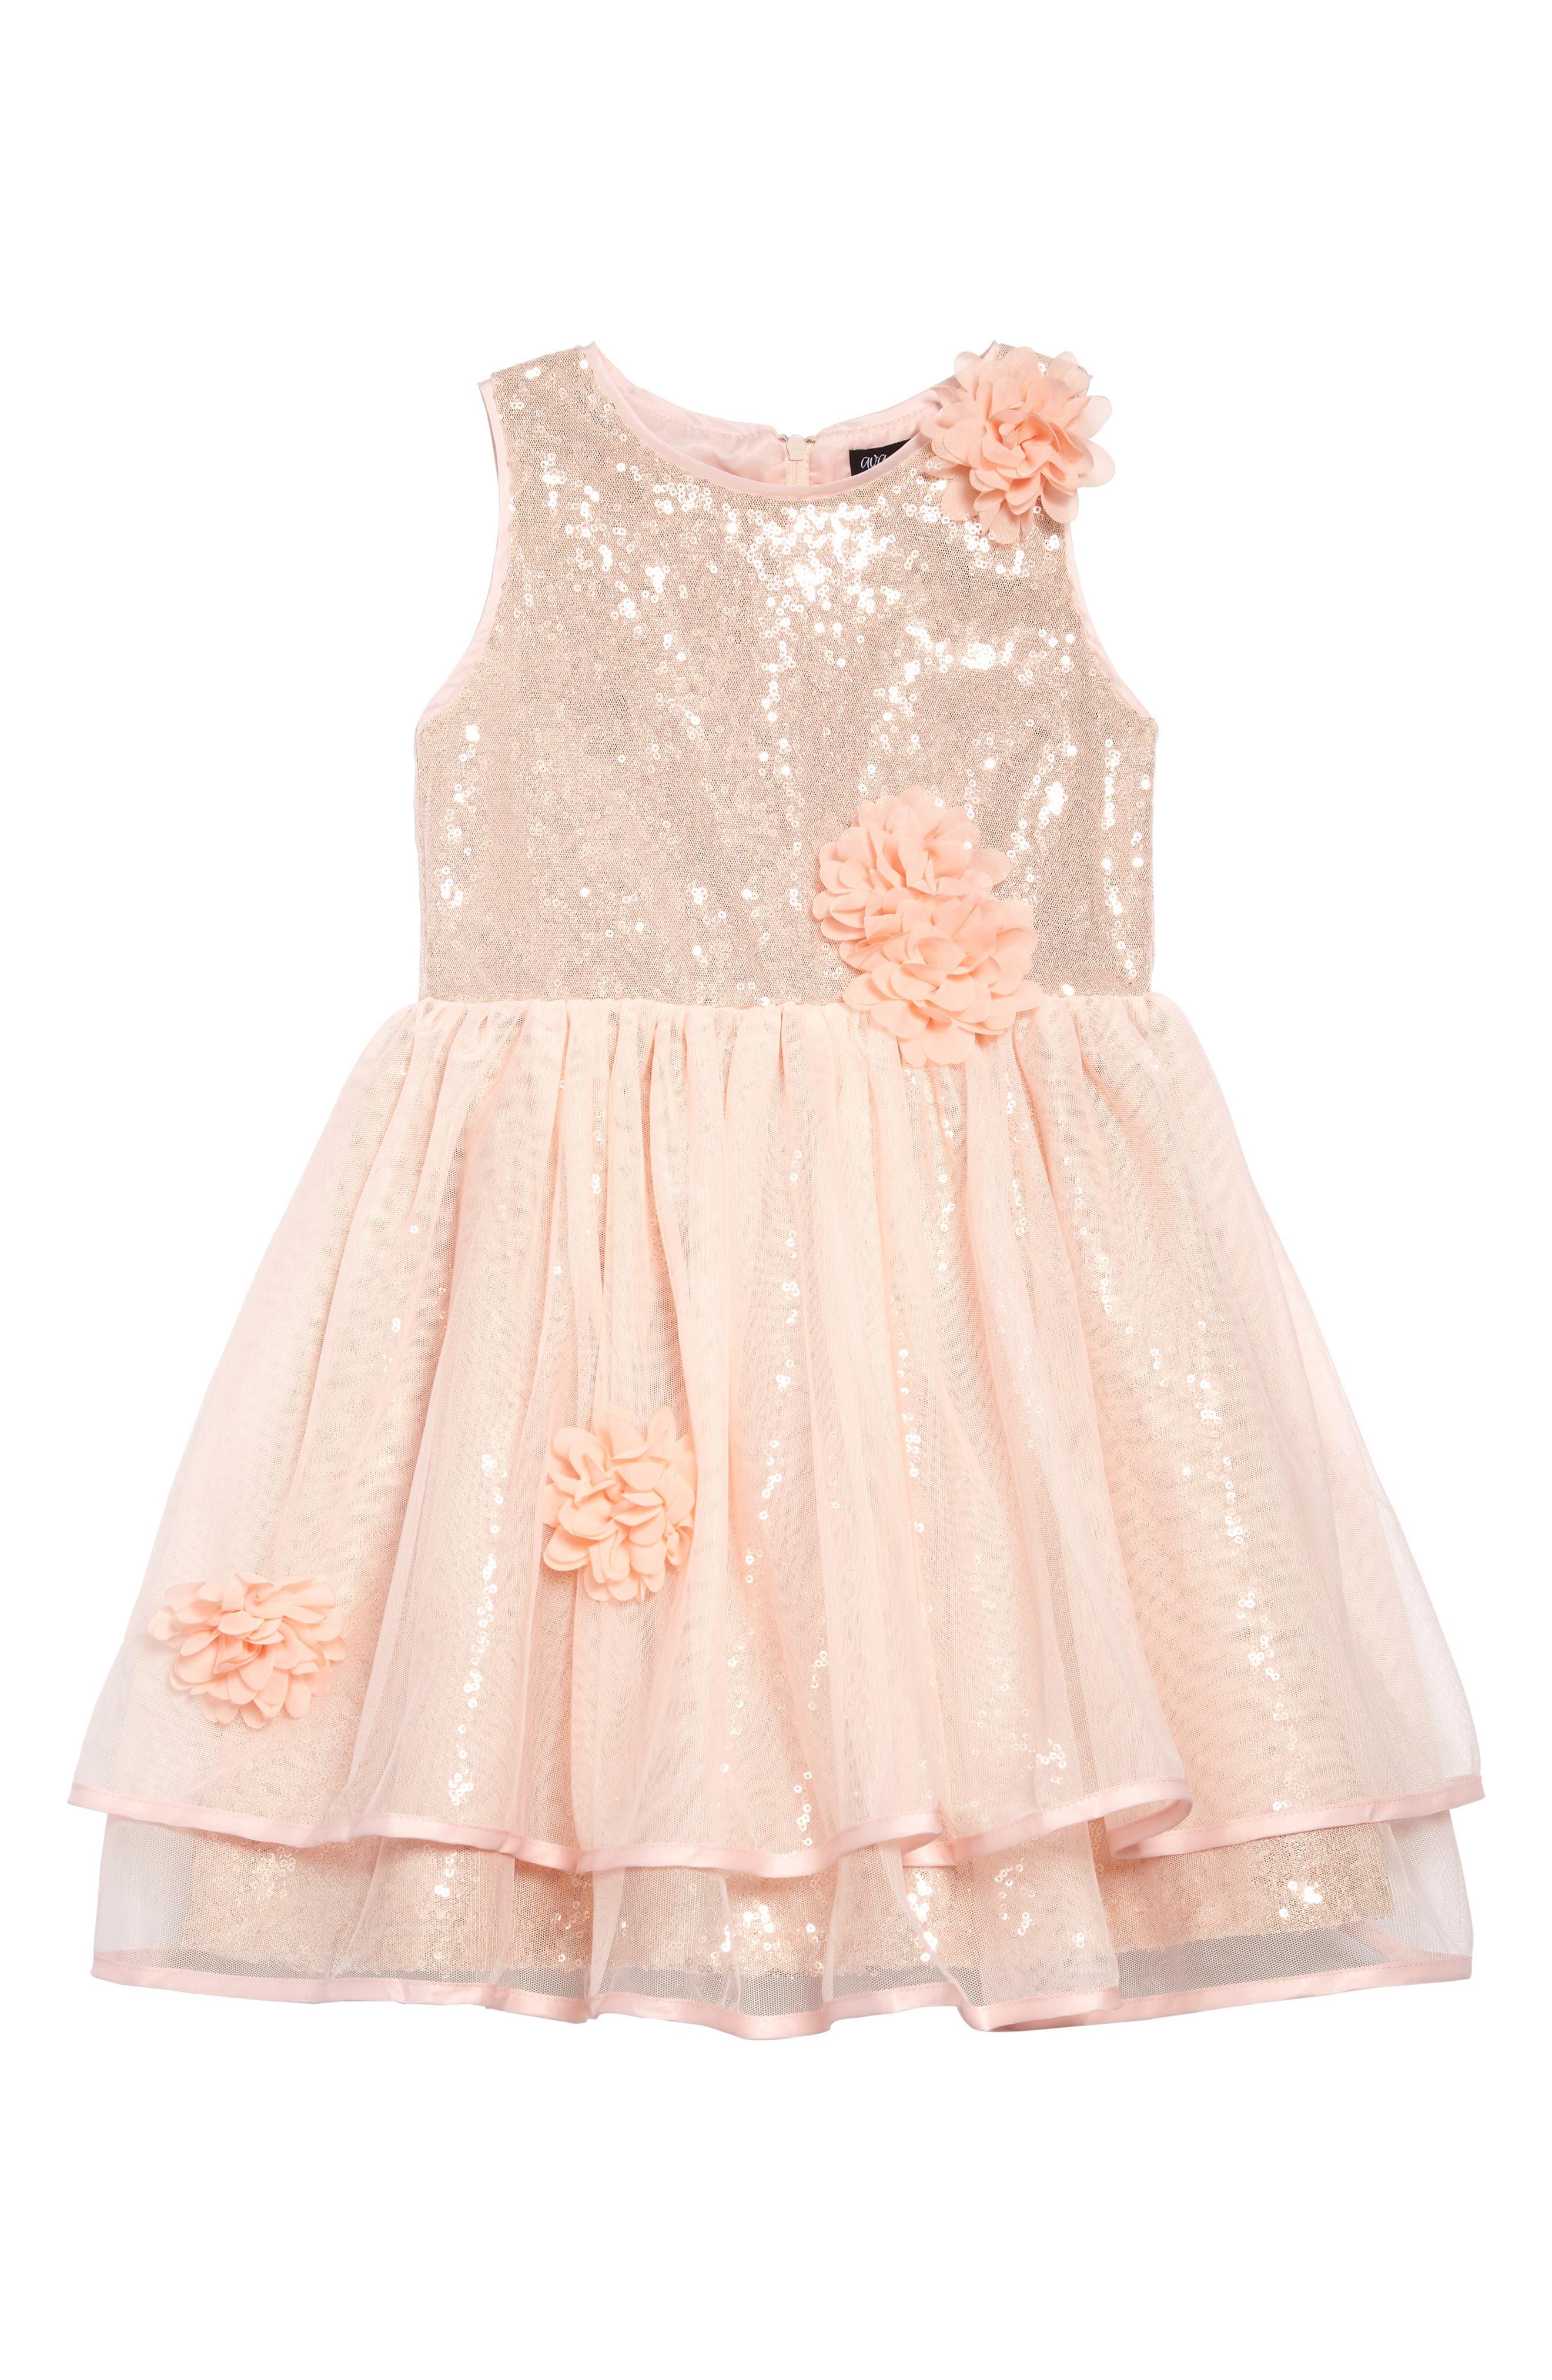 AVA & YELLY Floral Appliqué Sequin Dress, Main, color, BLUSH